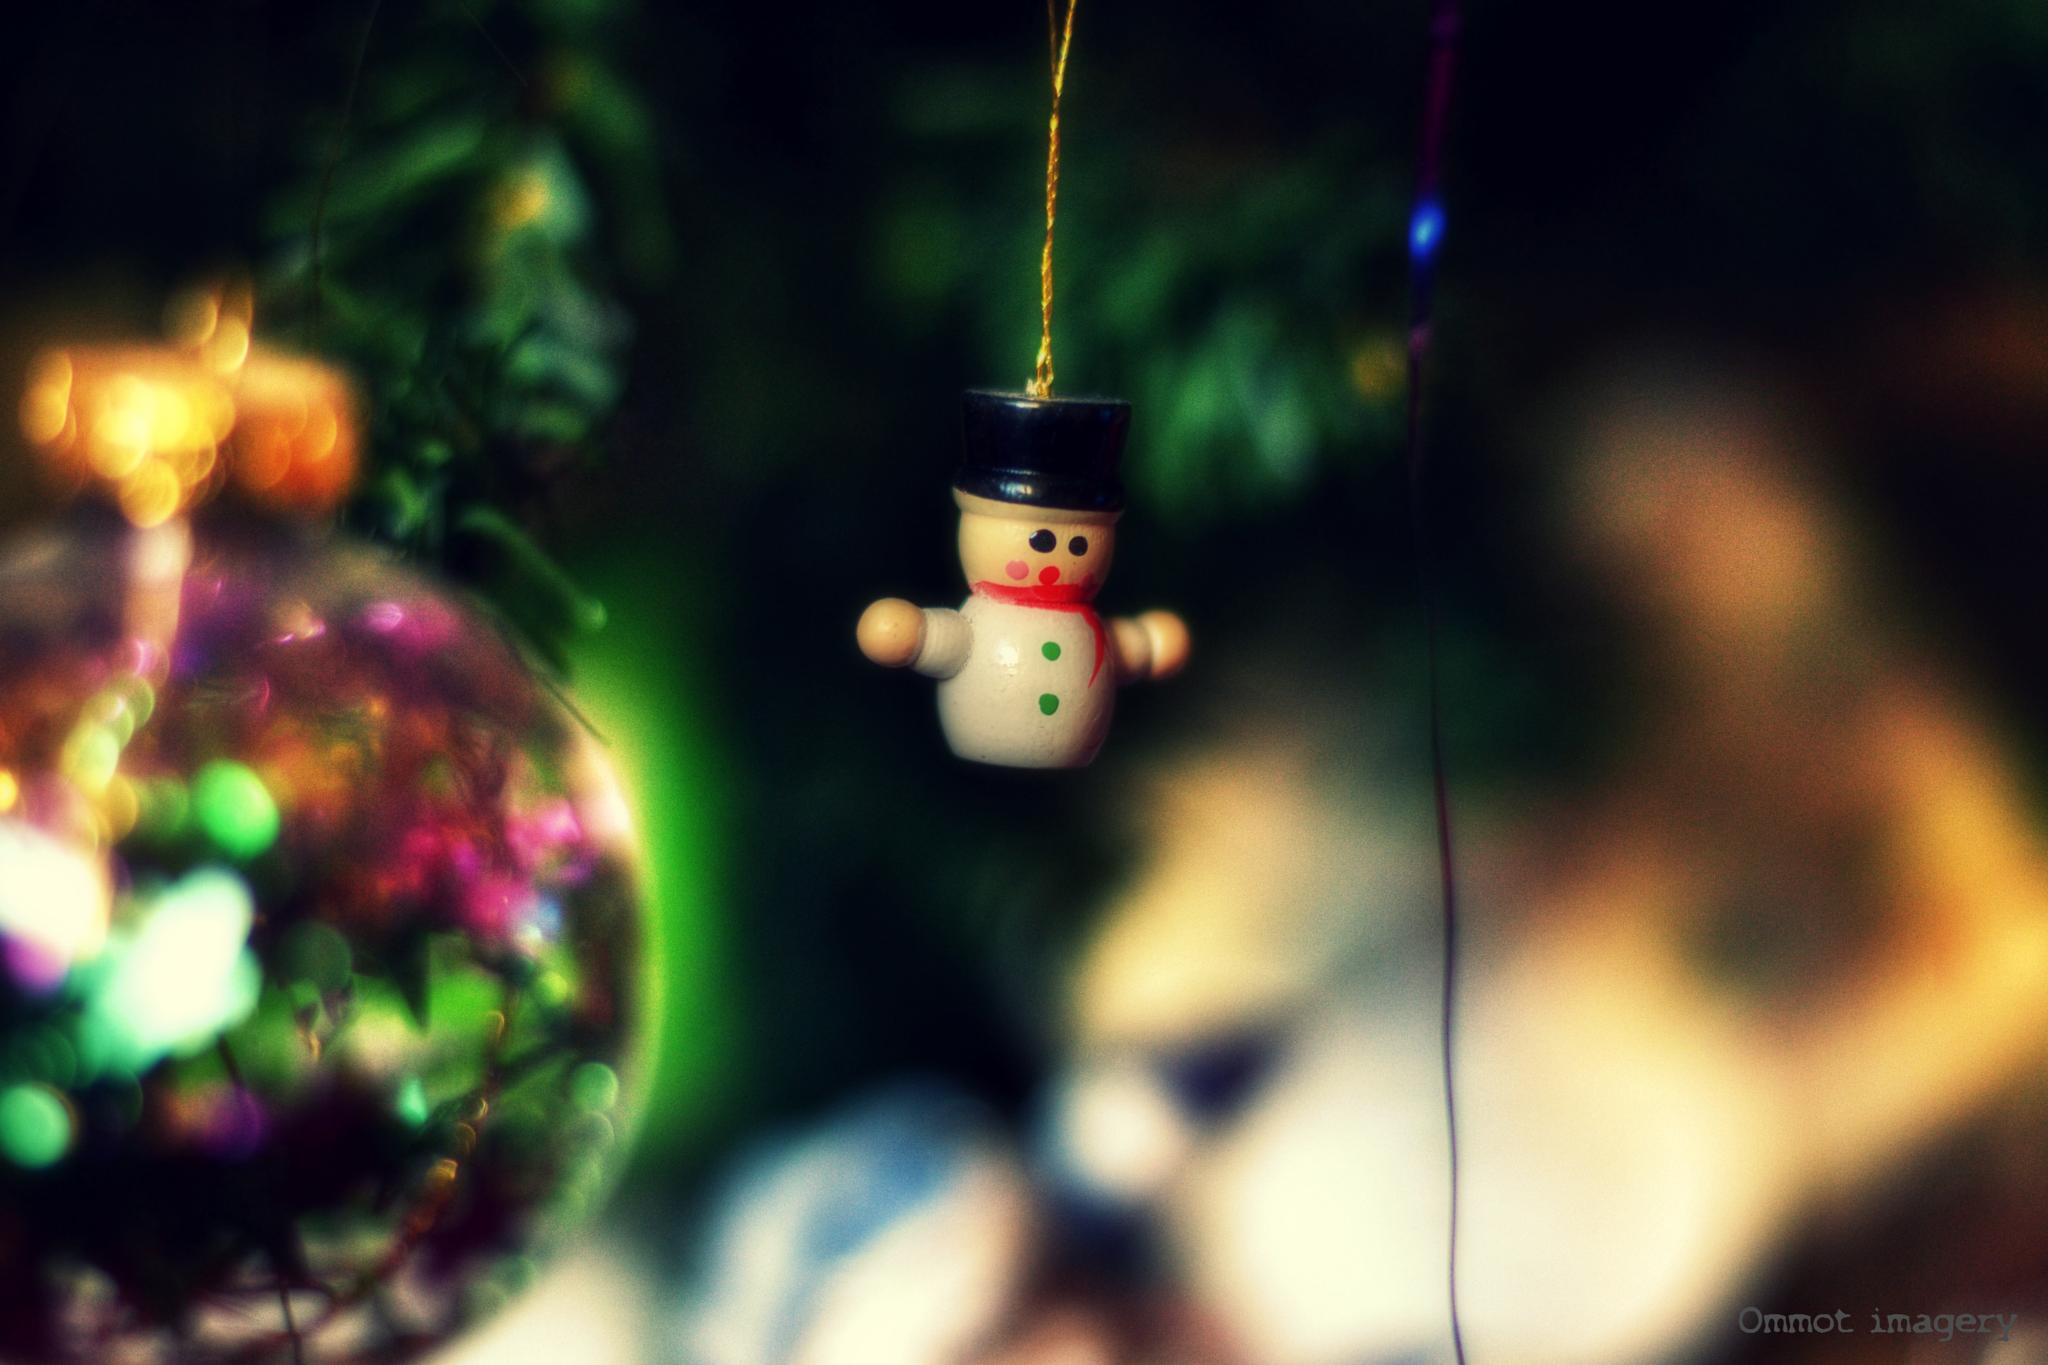 The Happy Snowman by Steve Thomas